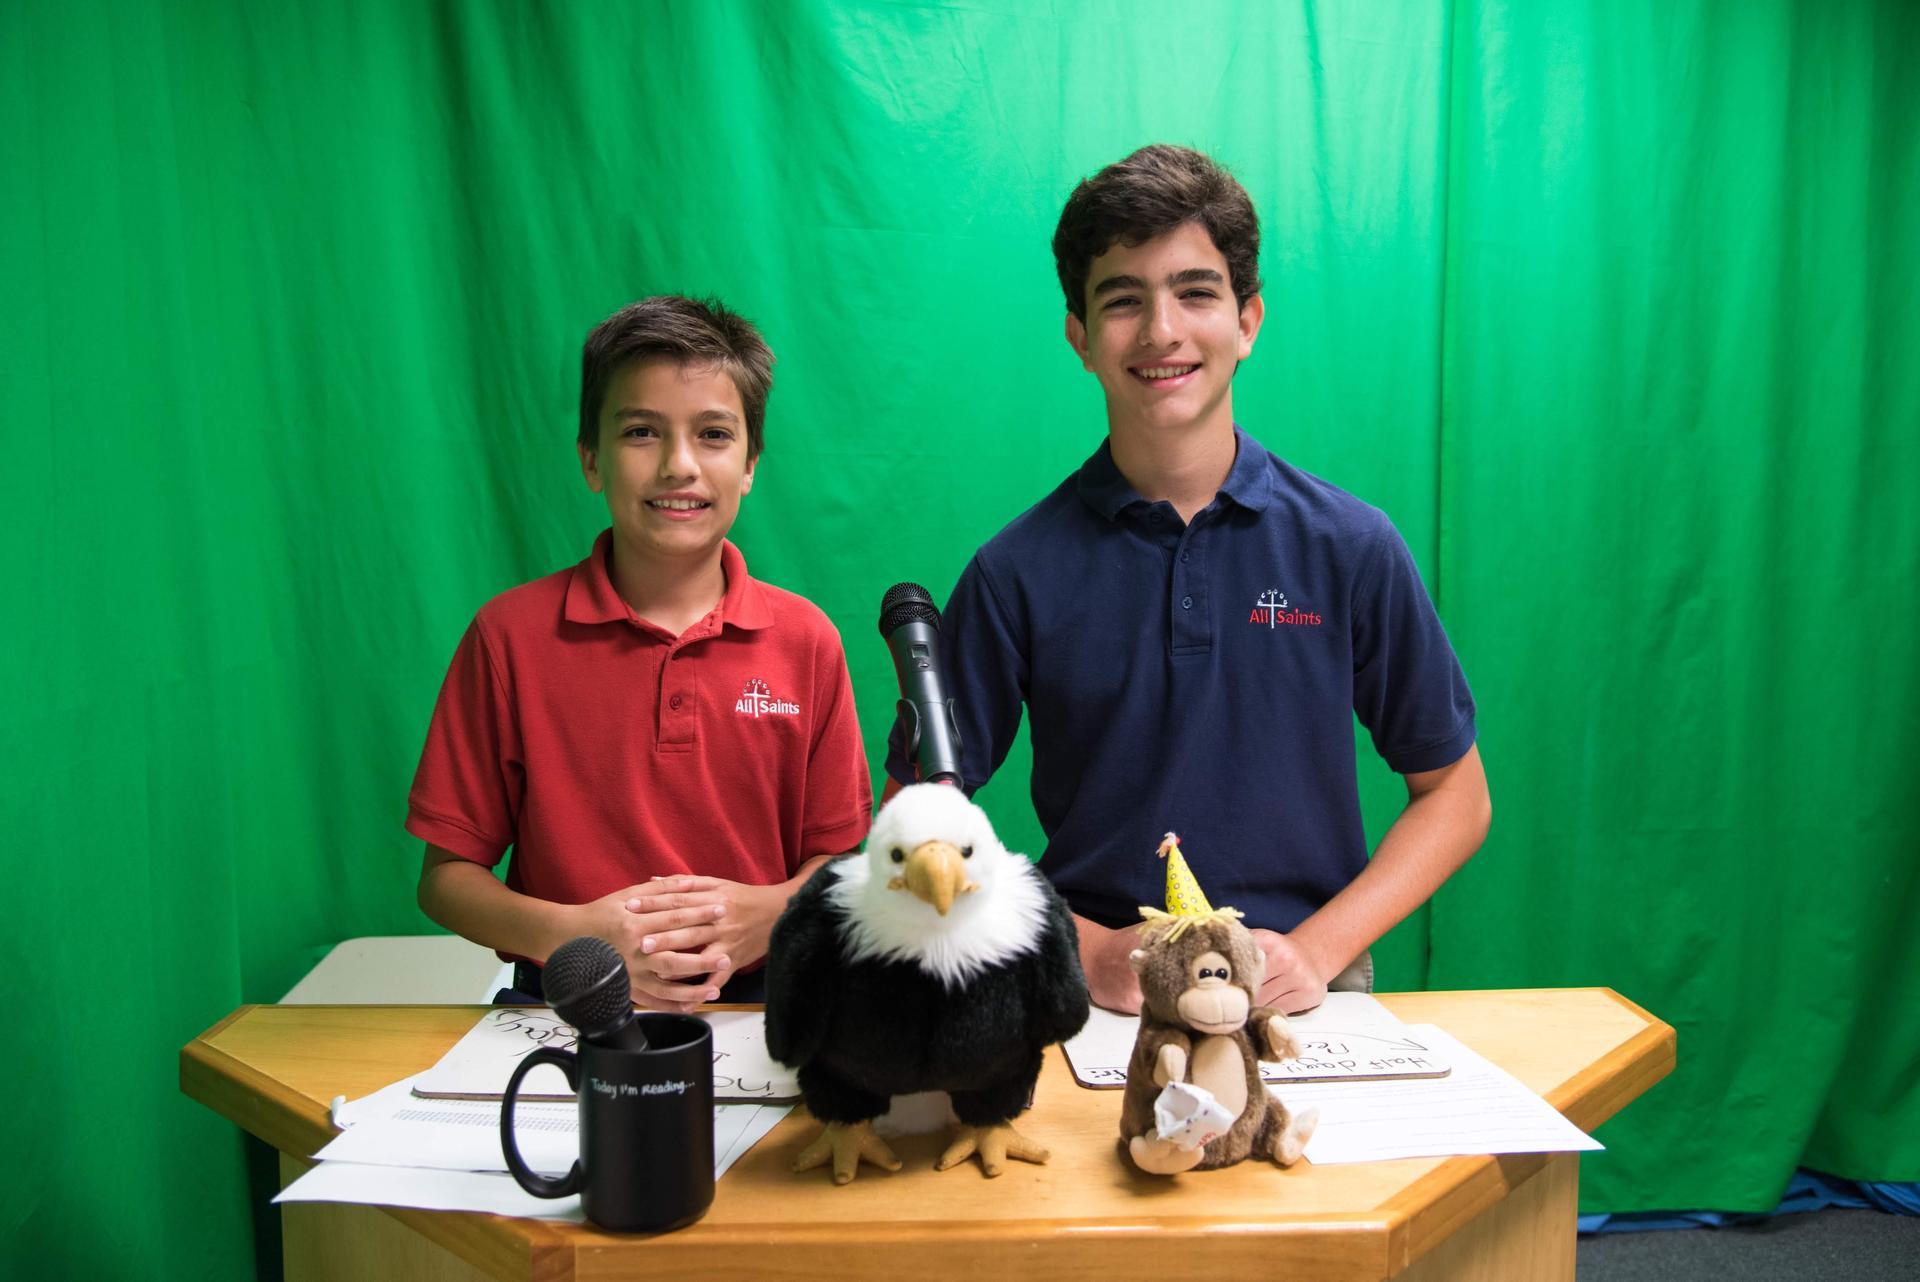 Eagle News Network Crew